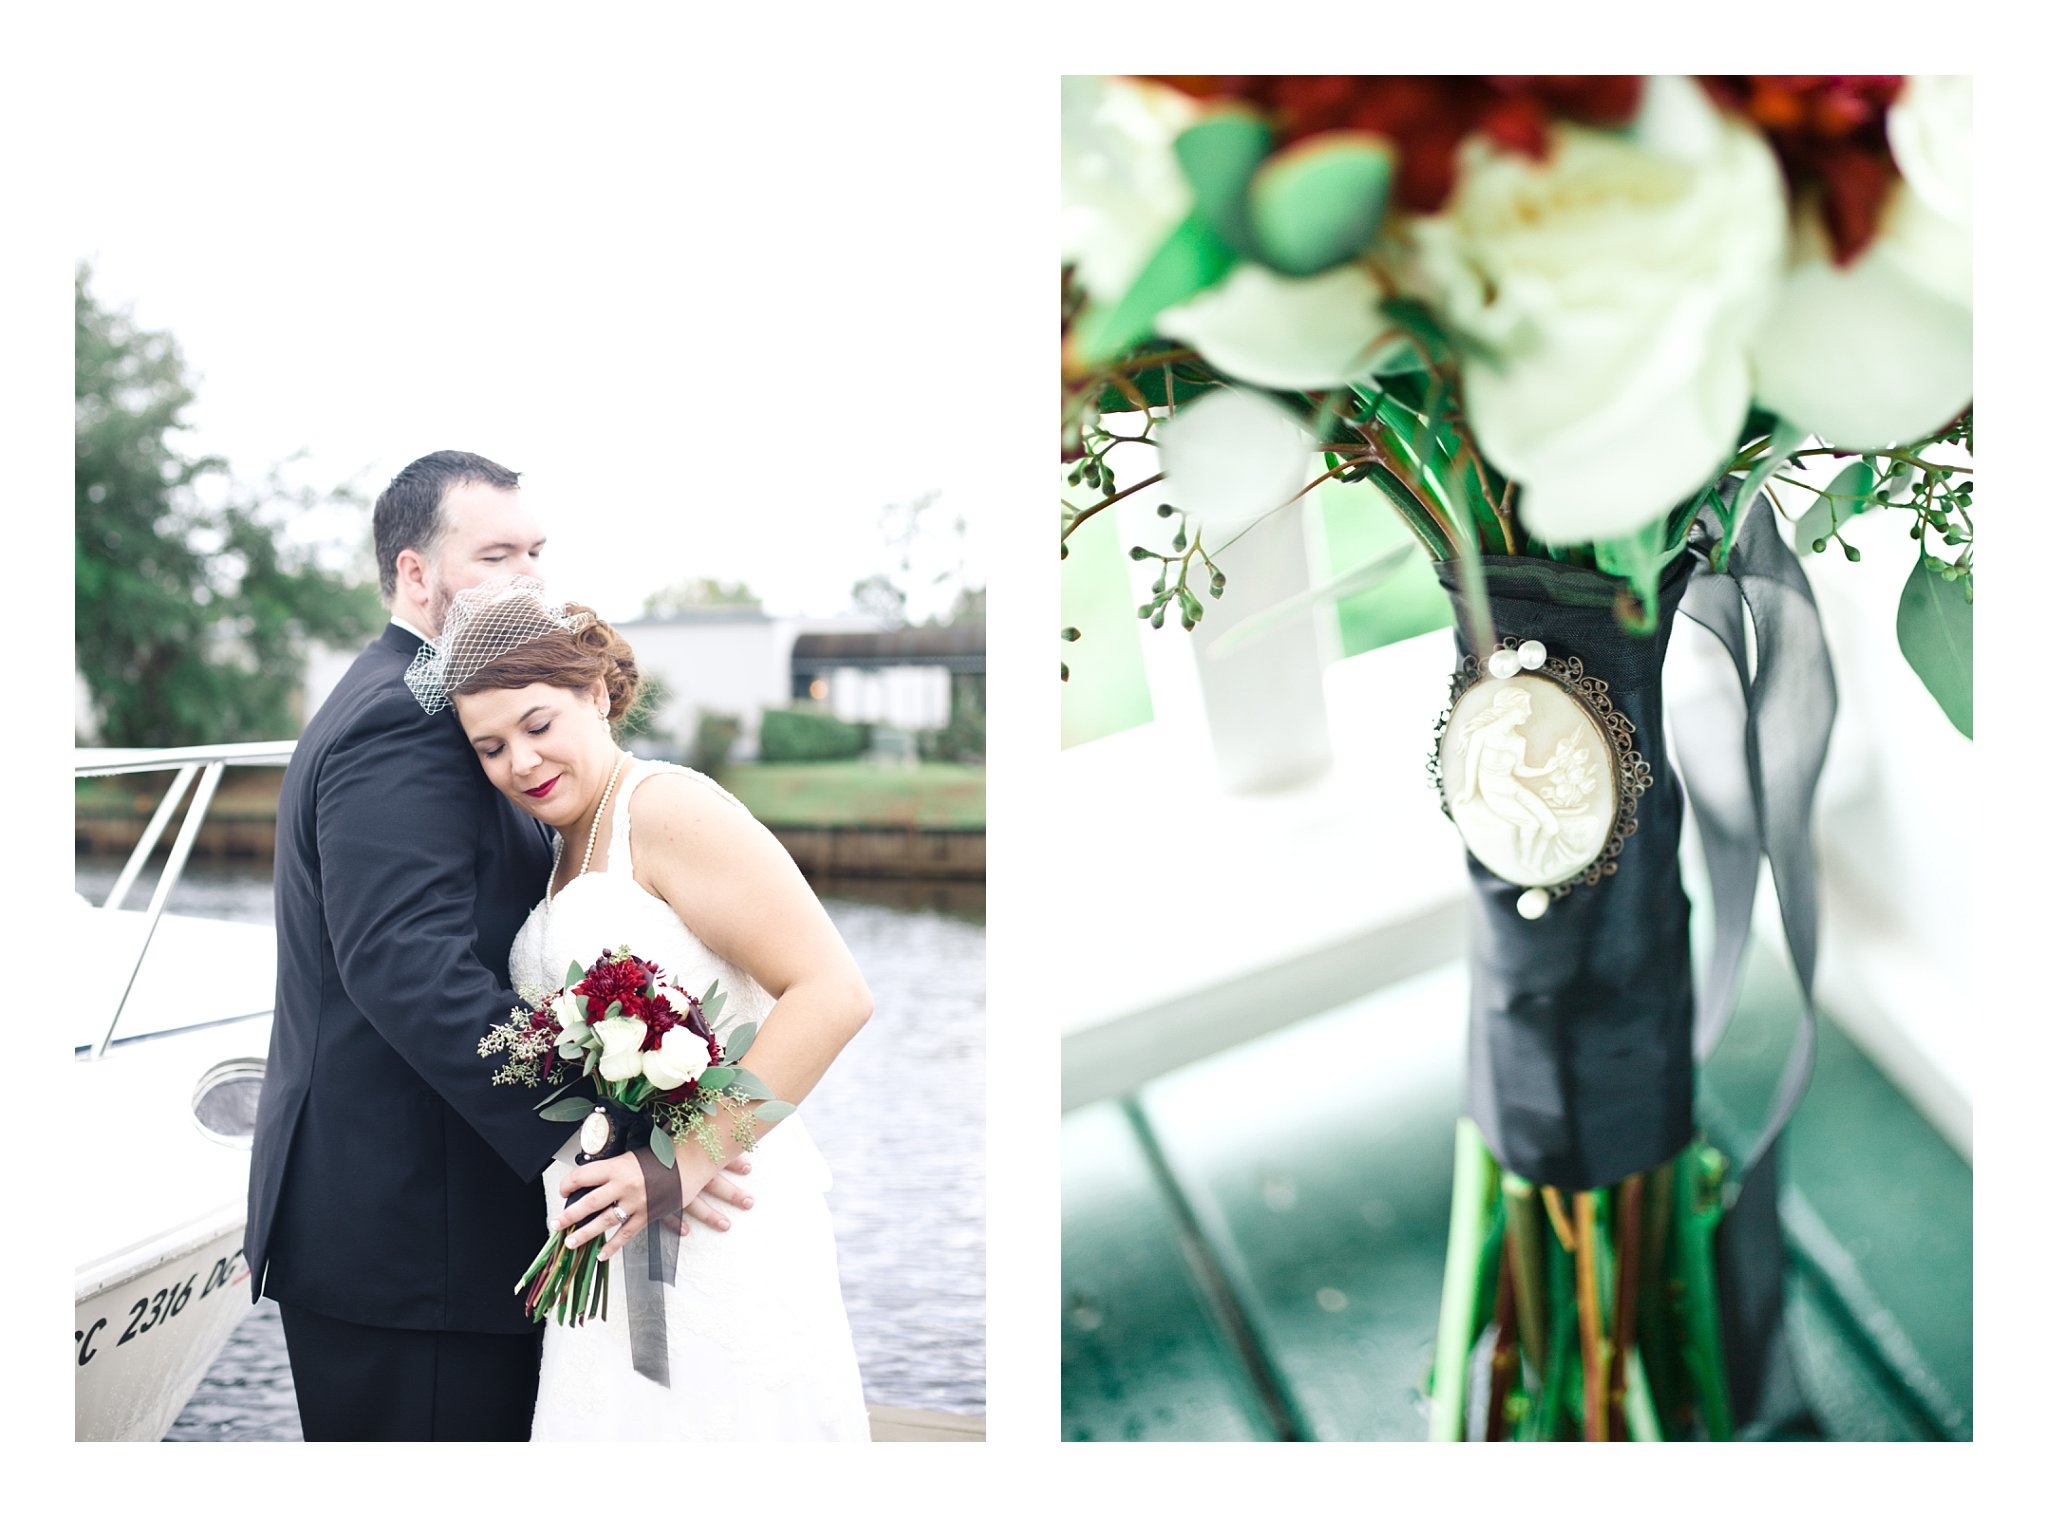 cypress-inn-garnet-black-lowcountry-vintage-wedding-conway-sc-photos_0136.jpg